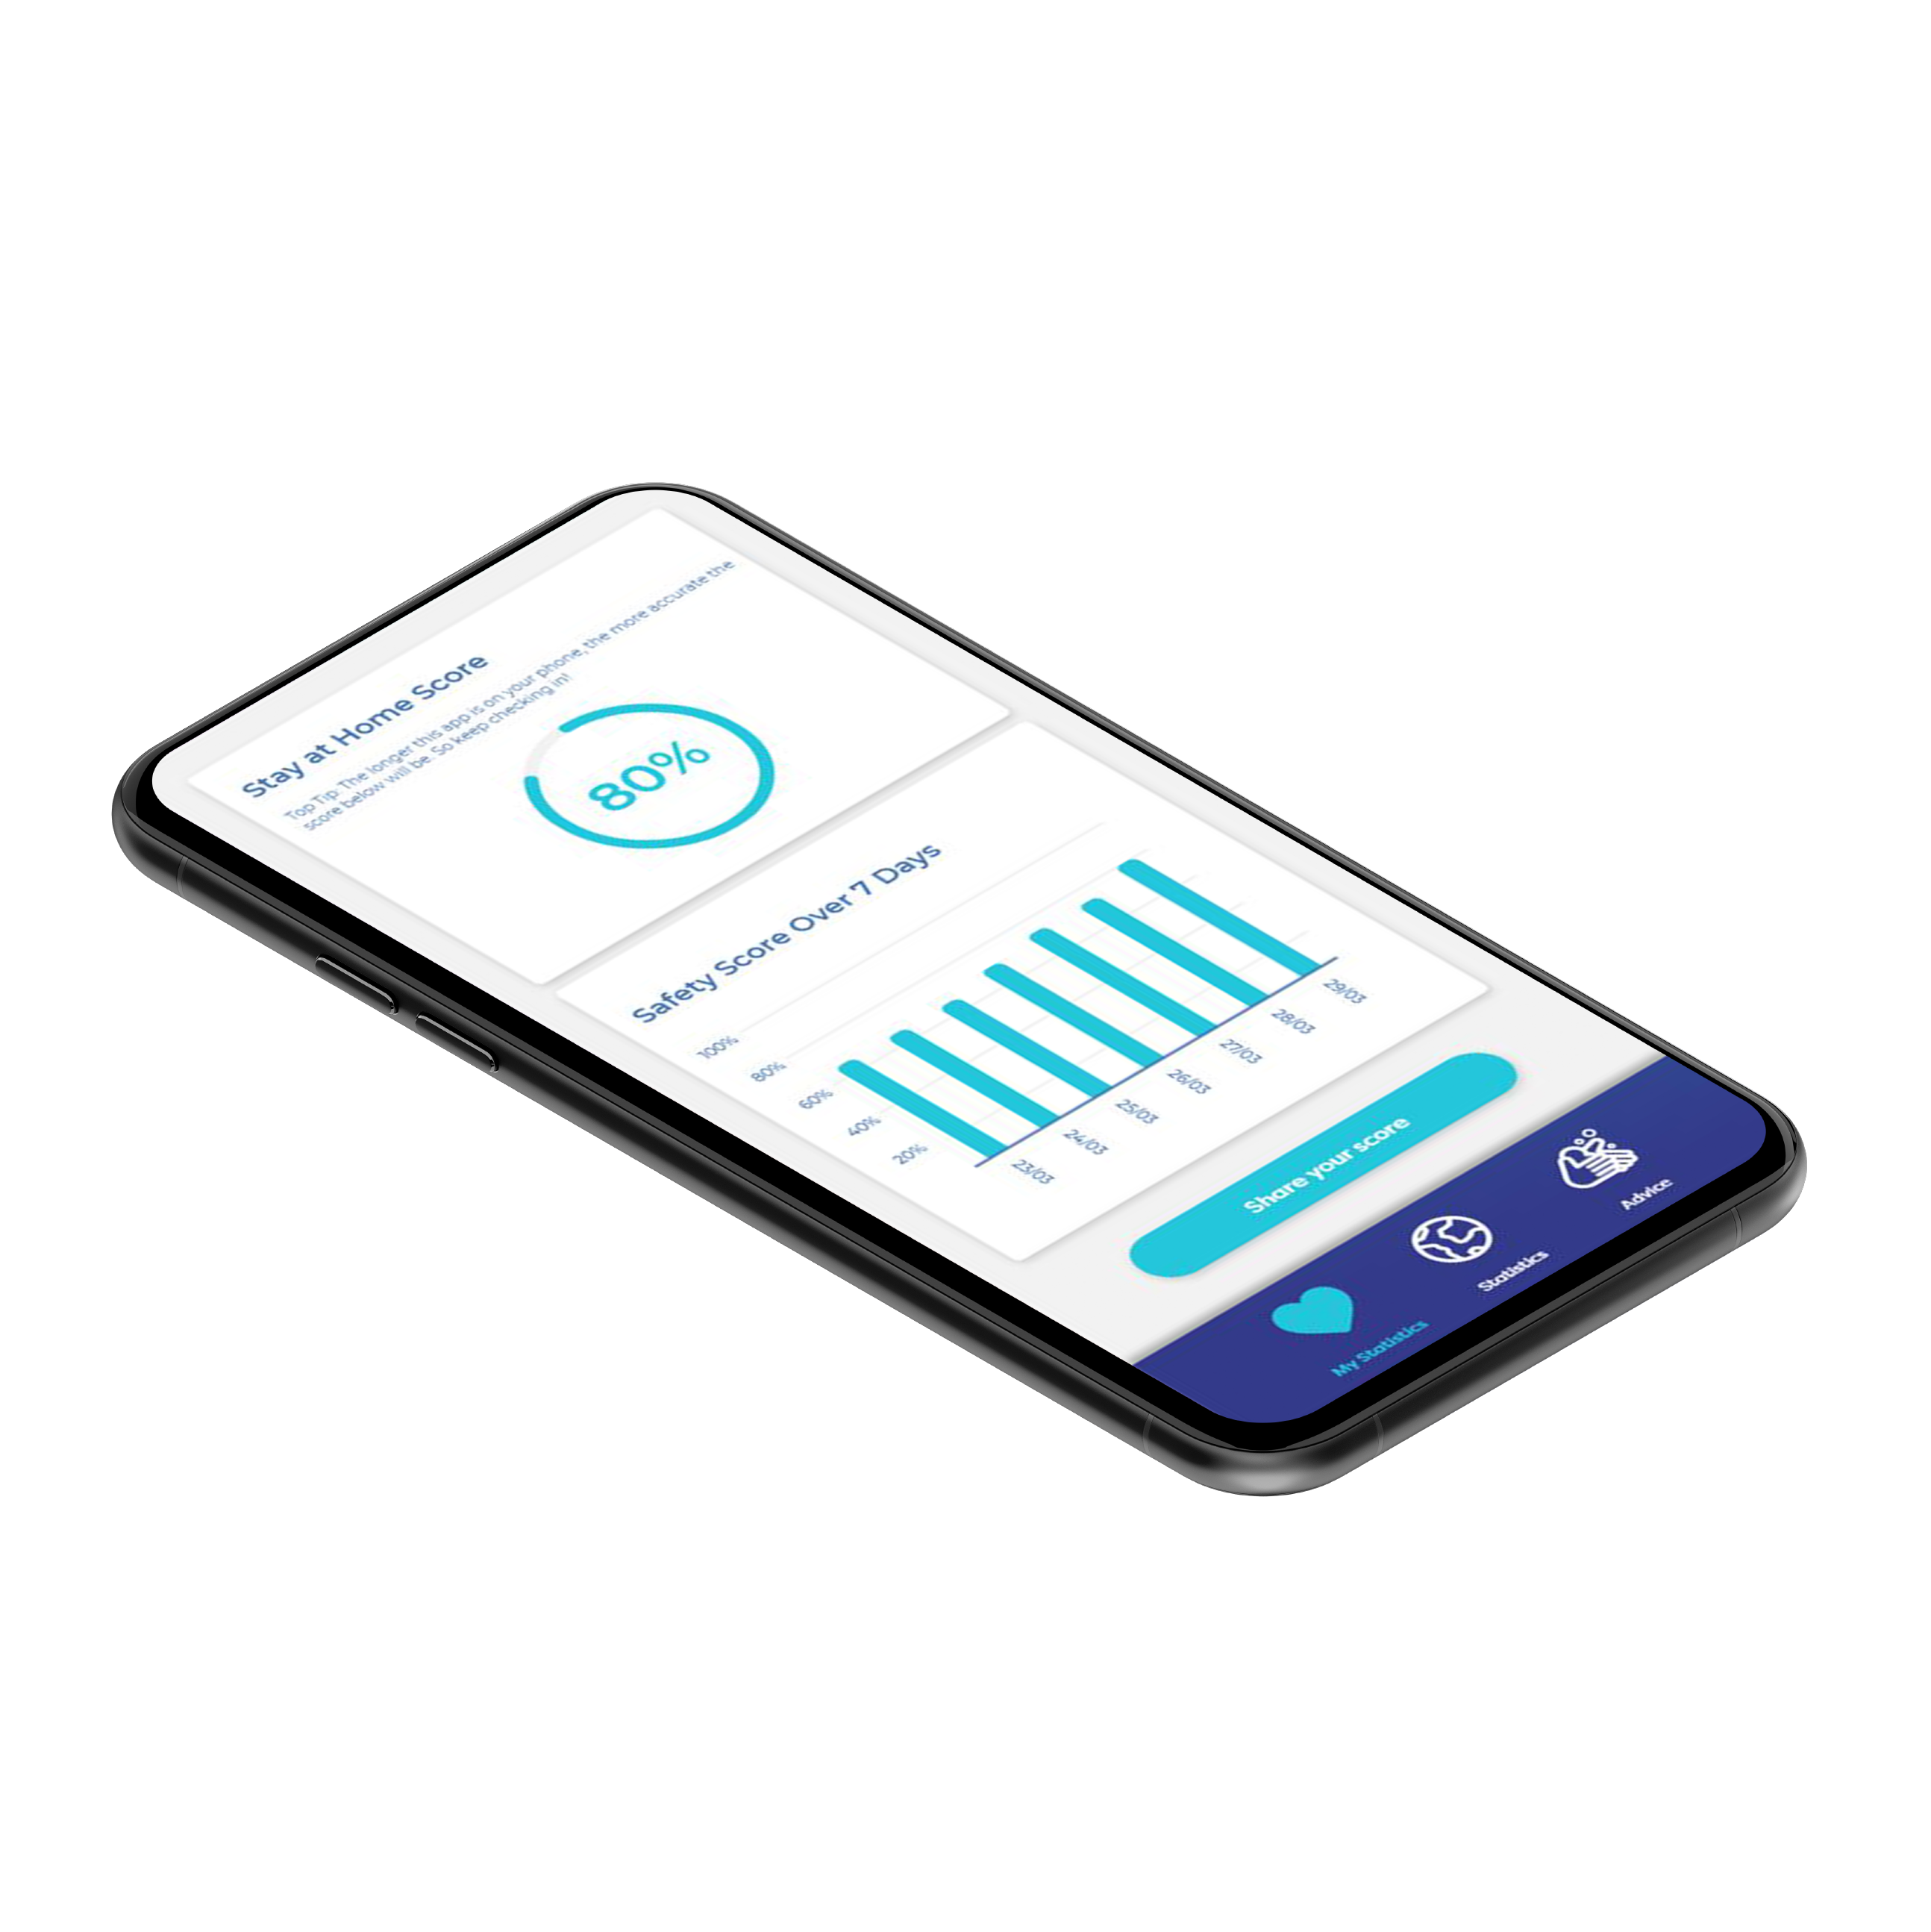 StayAtHome App on a smartphone